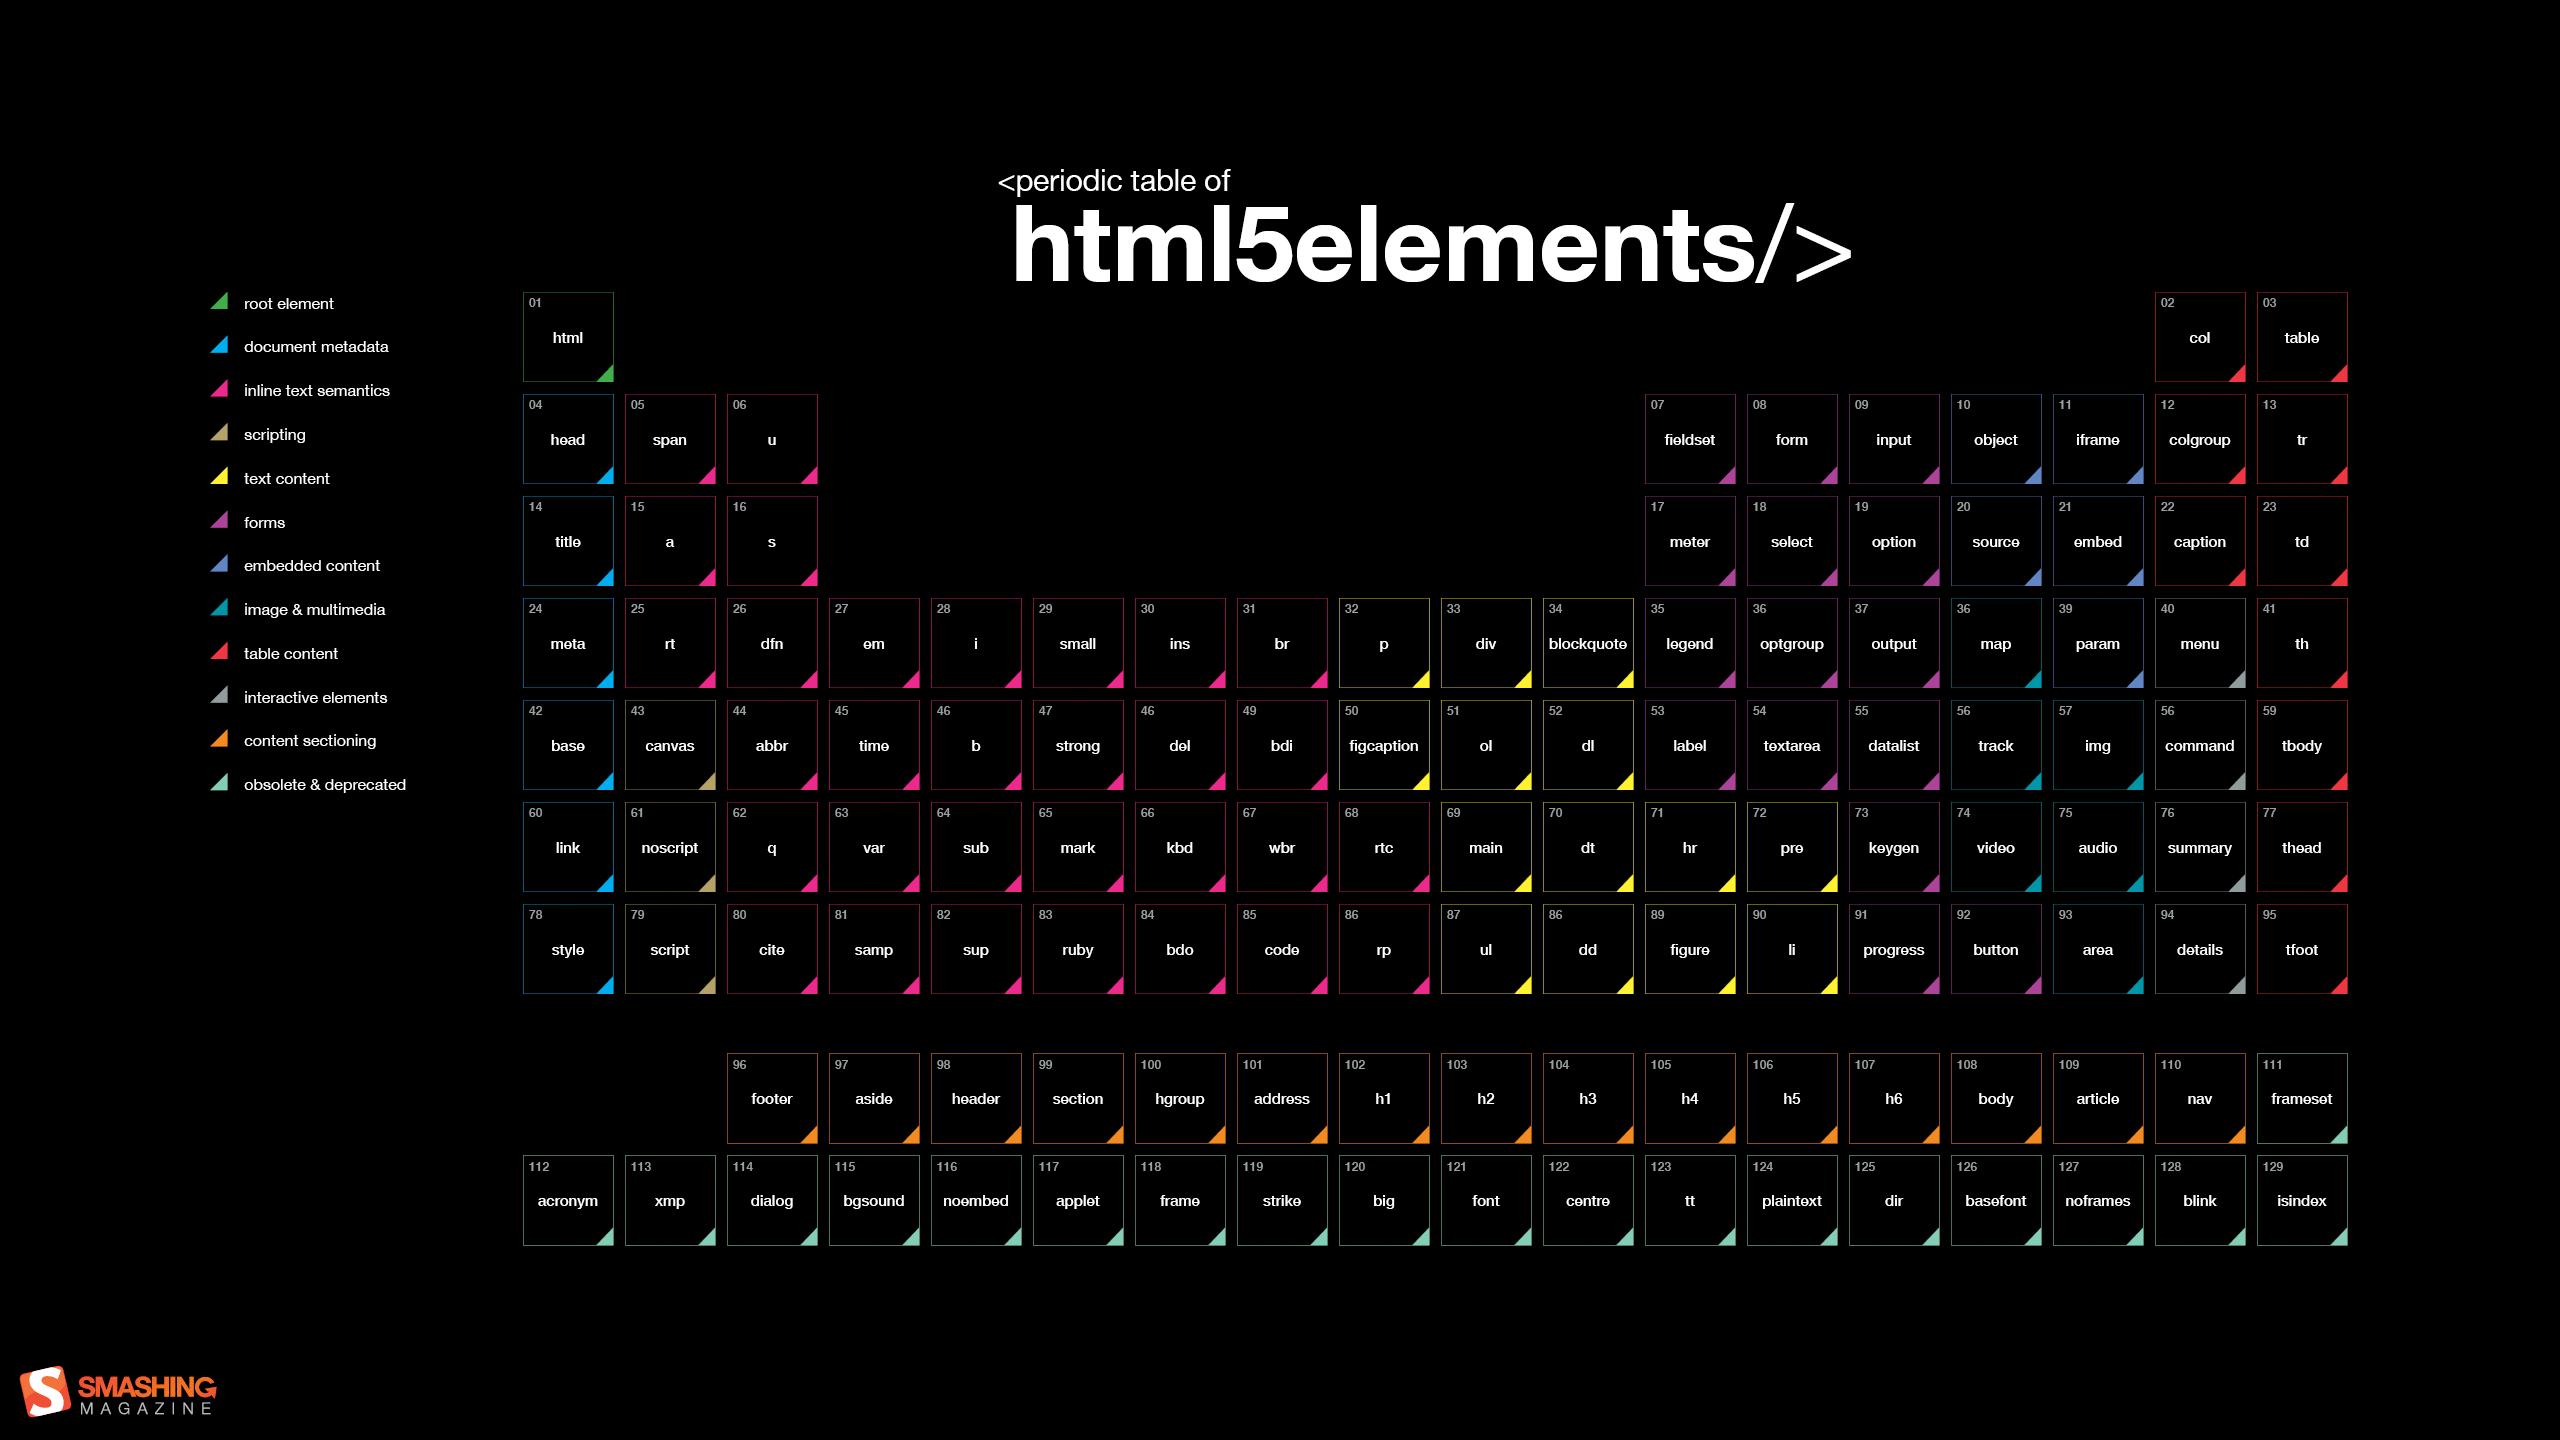 Periodic table of html 5 elements codeg 25601440 programao periodic table of html 5 elements codeg 25601440 urtaz Gallery